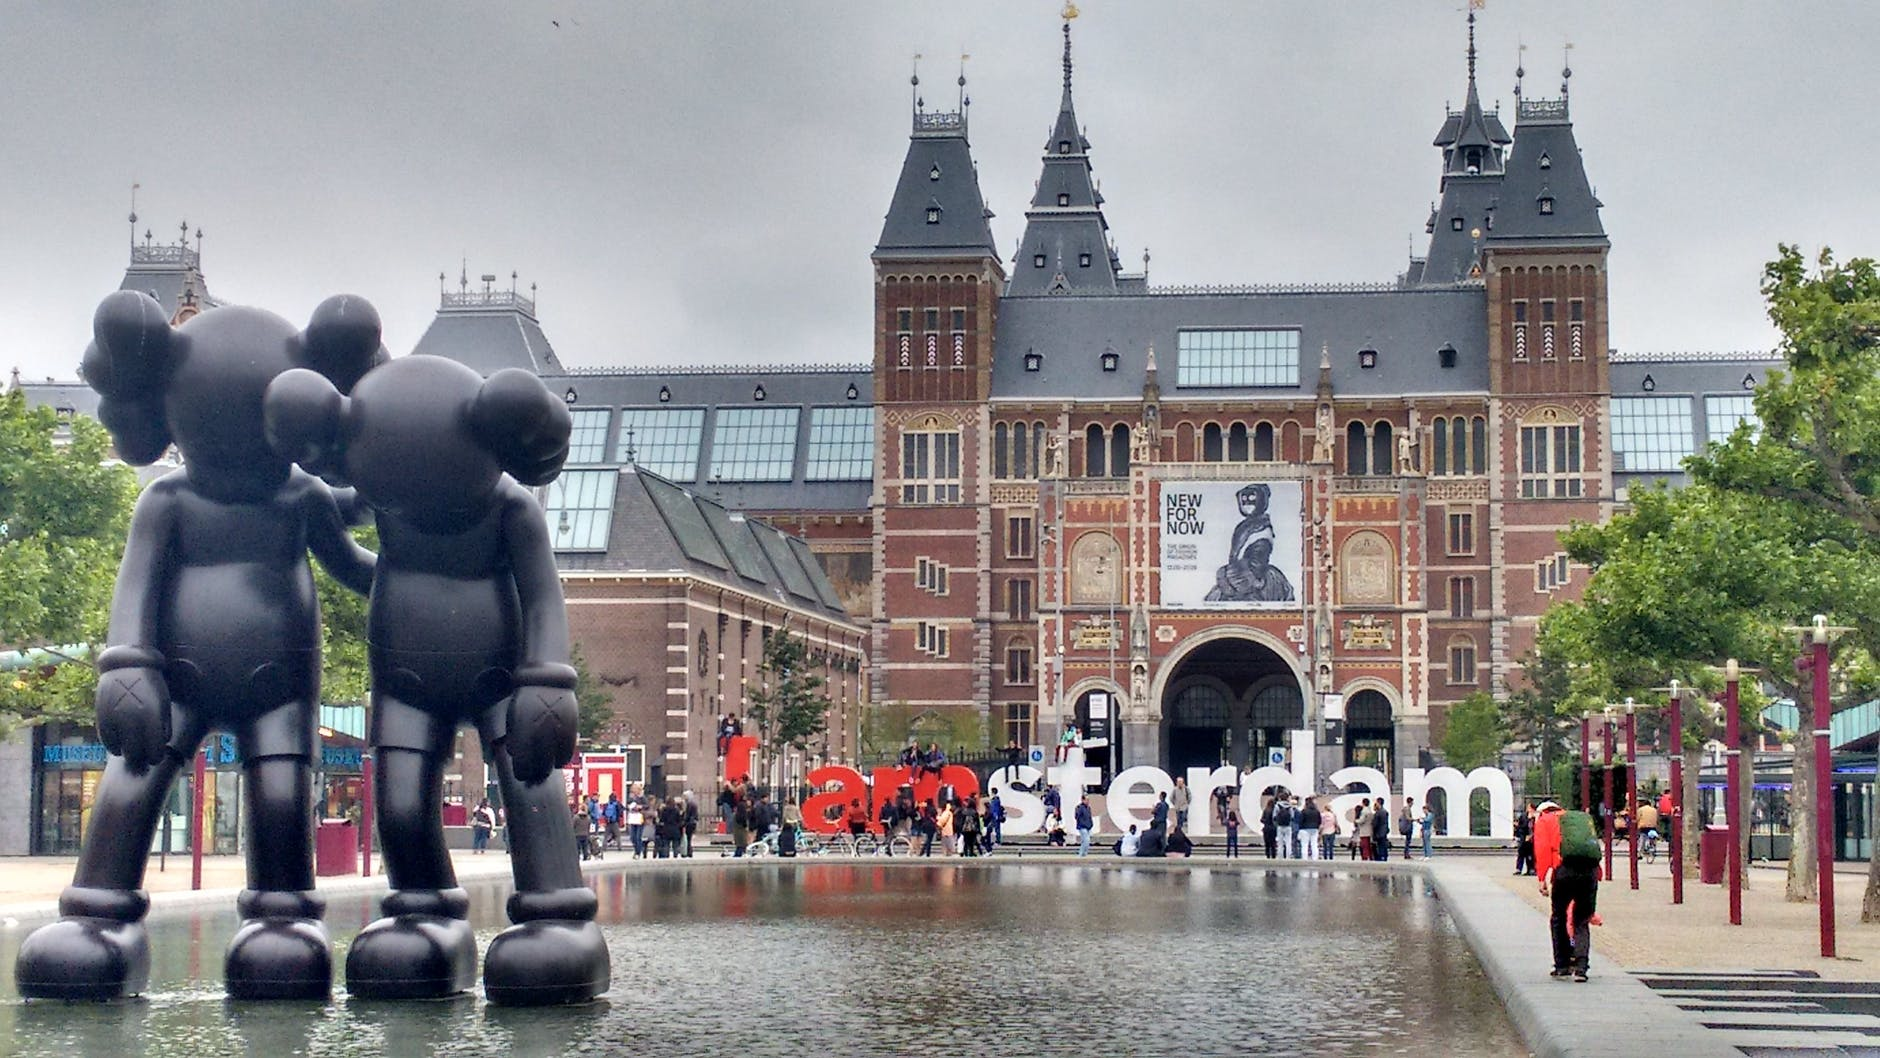 https://www.pexels.com/photo/amsterdam-architecture-building-capital-208733/